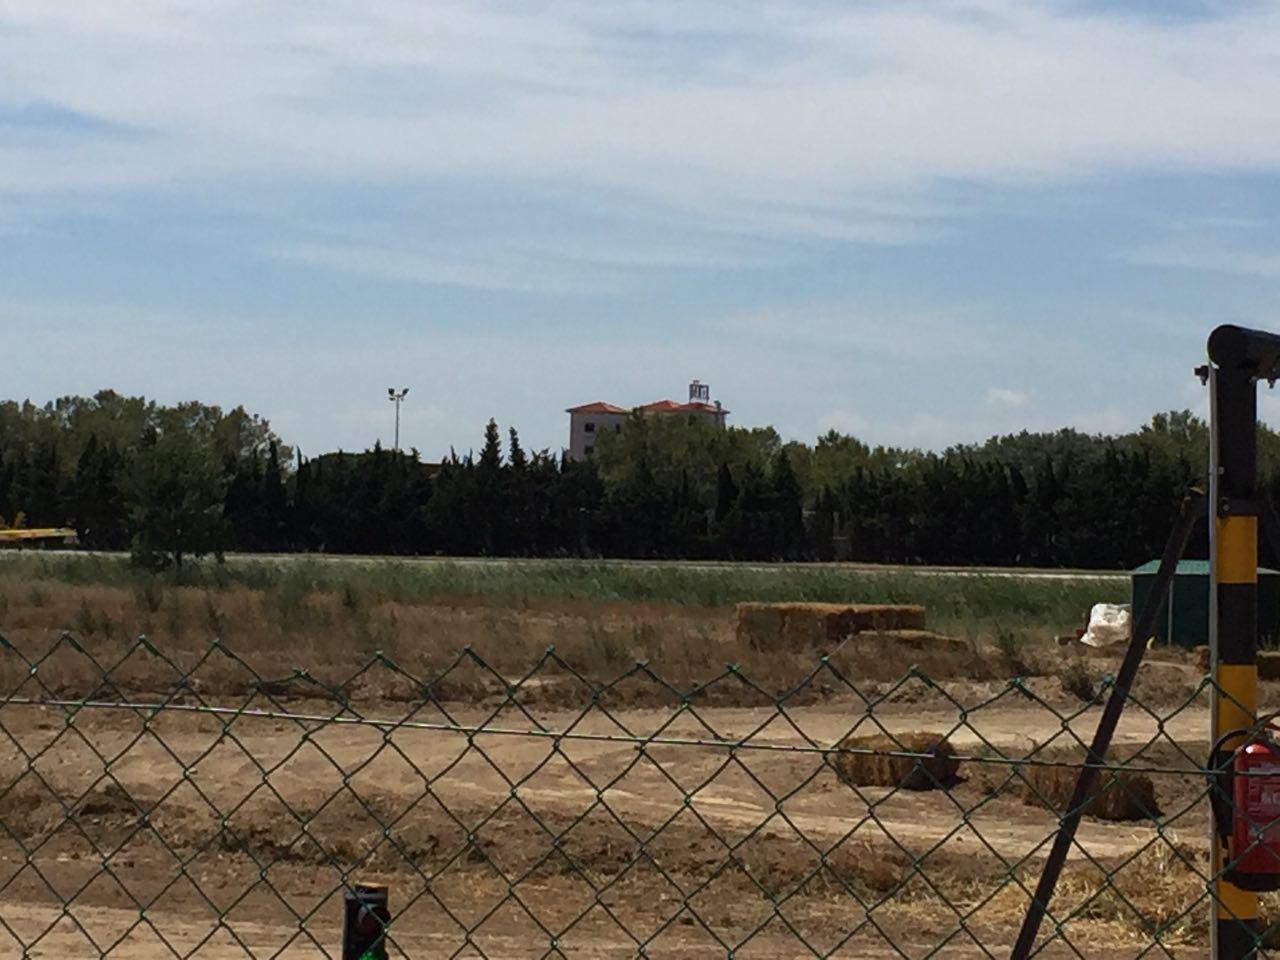 Circuito Racing Cross Costa Brava Ø8m & 10m   Spain, Girona